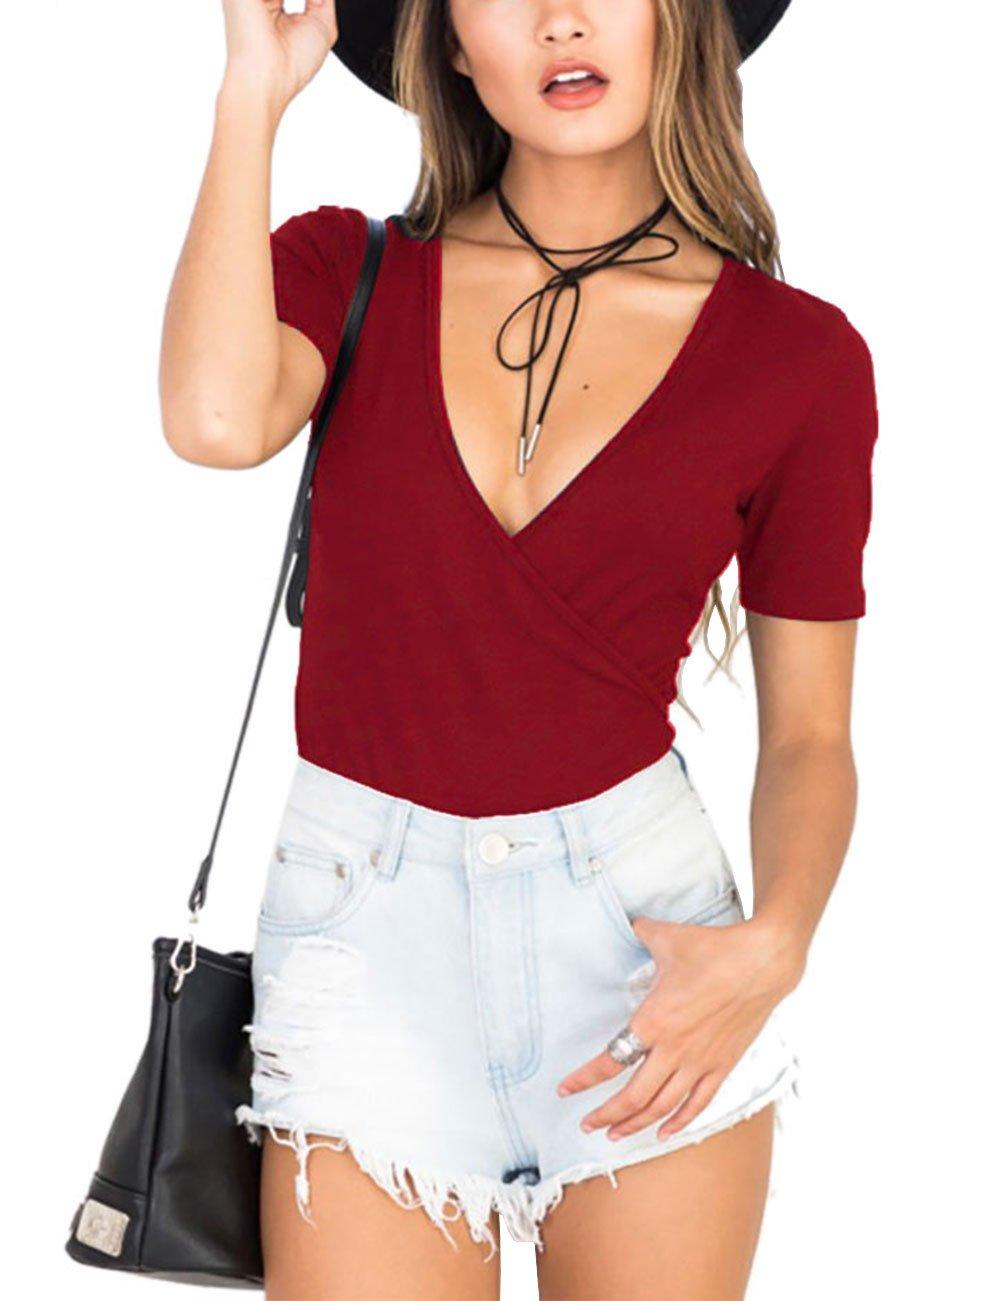 Akmipoem Teen Girls Sexy Deep V Neck Wrap Over Short Sleeve Solid Leotard Bodycon Bodysuit Jumpsuit Wine Red M